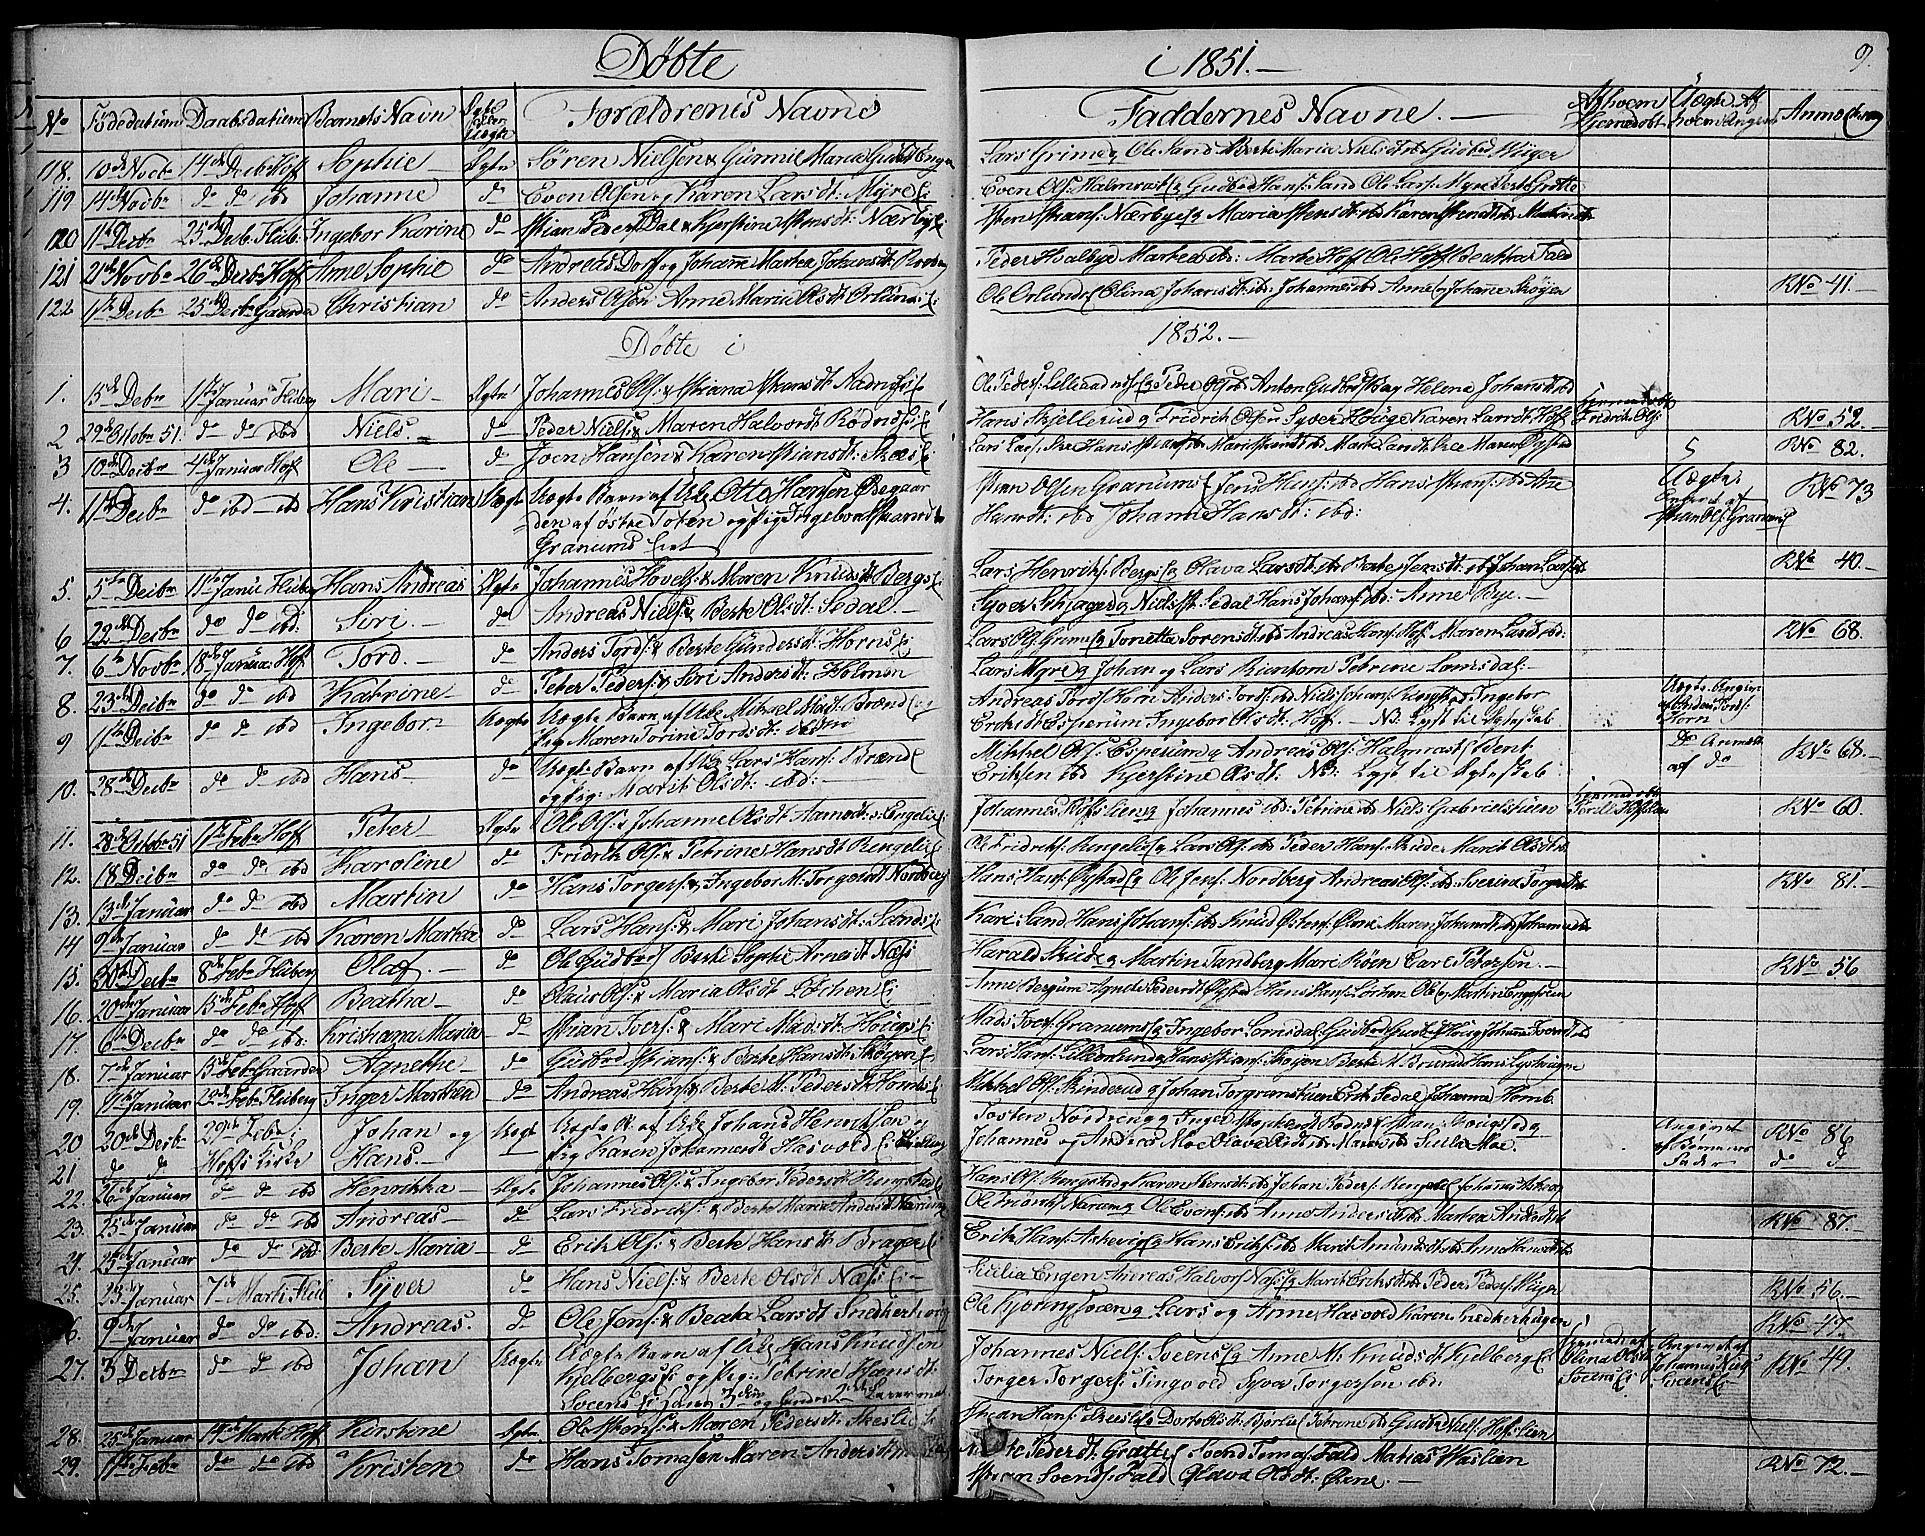 SAH, Søndre Land prestekontor, L/L0001: Klokkerbok nr. 1, 1849-1883, s. 9